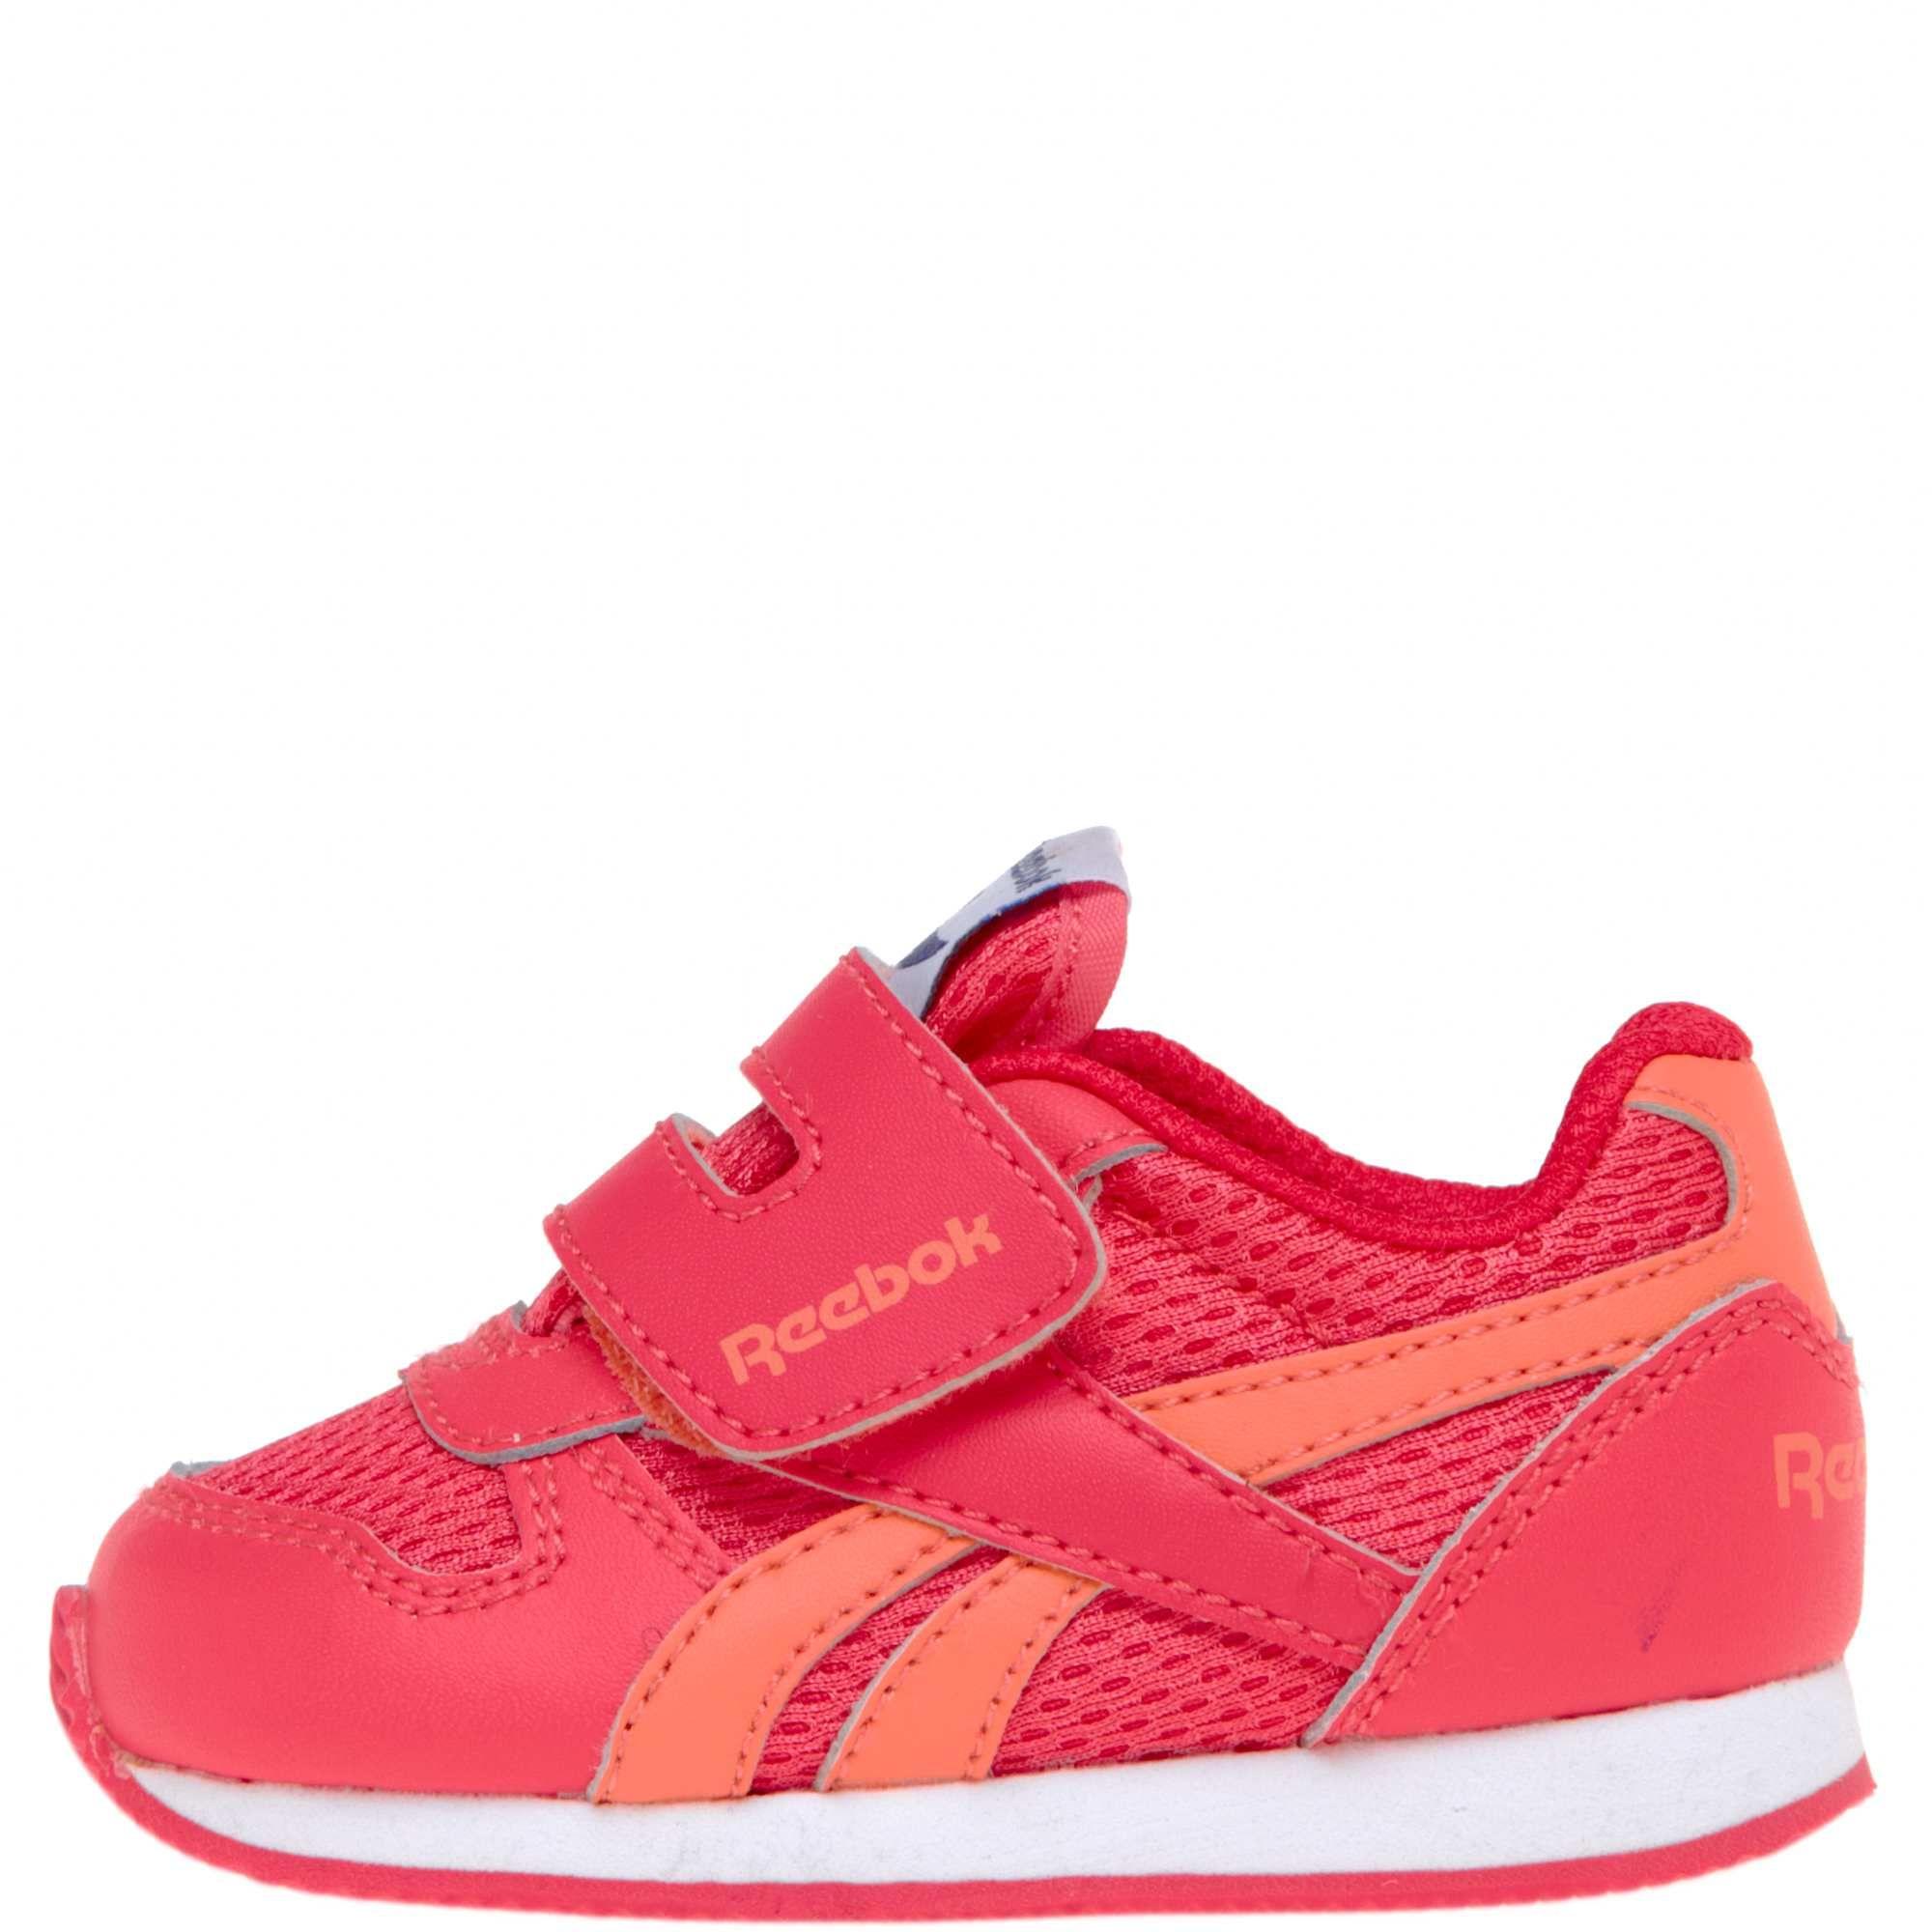 lanzadera Sada divorcio  zapatillas reebok bebe niña - 65% descuento - www.prodeni.org